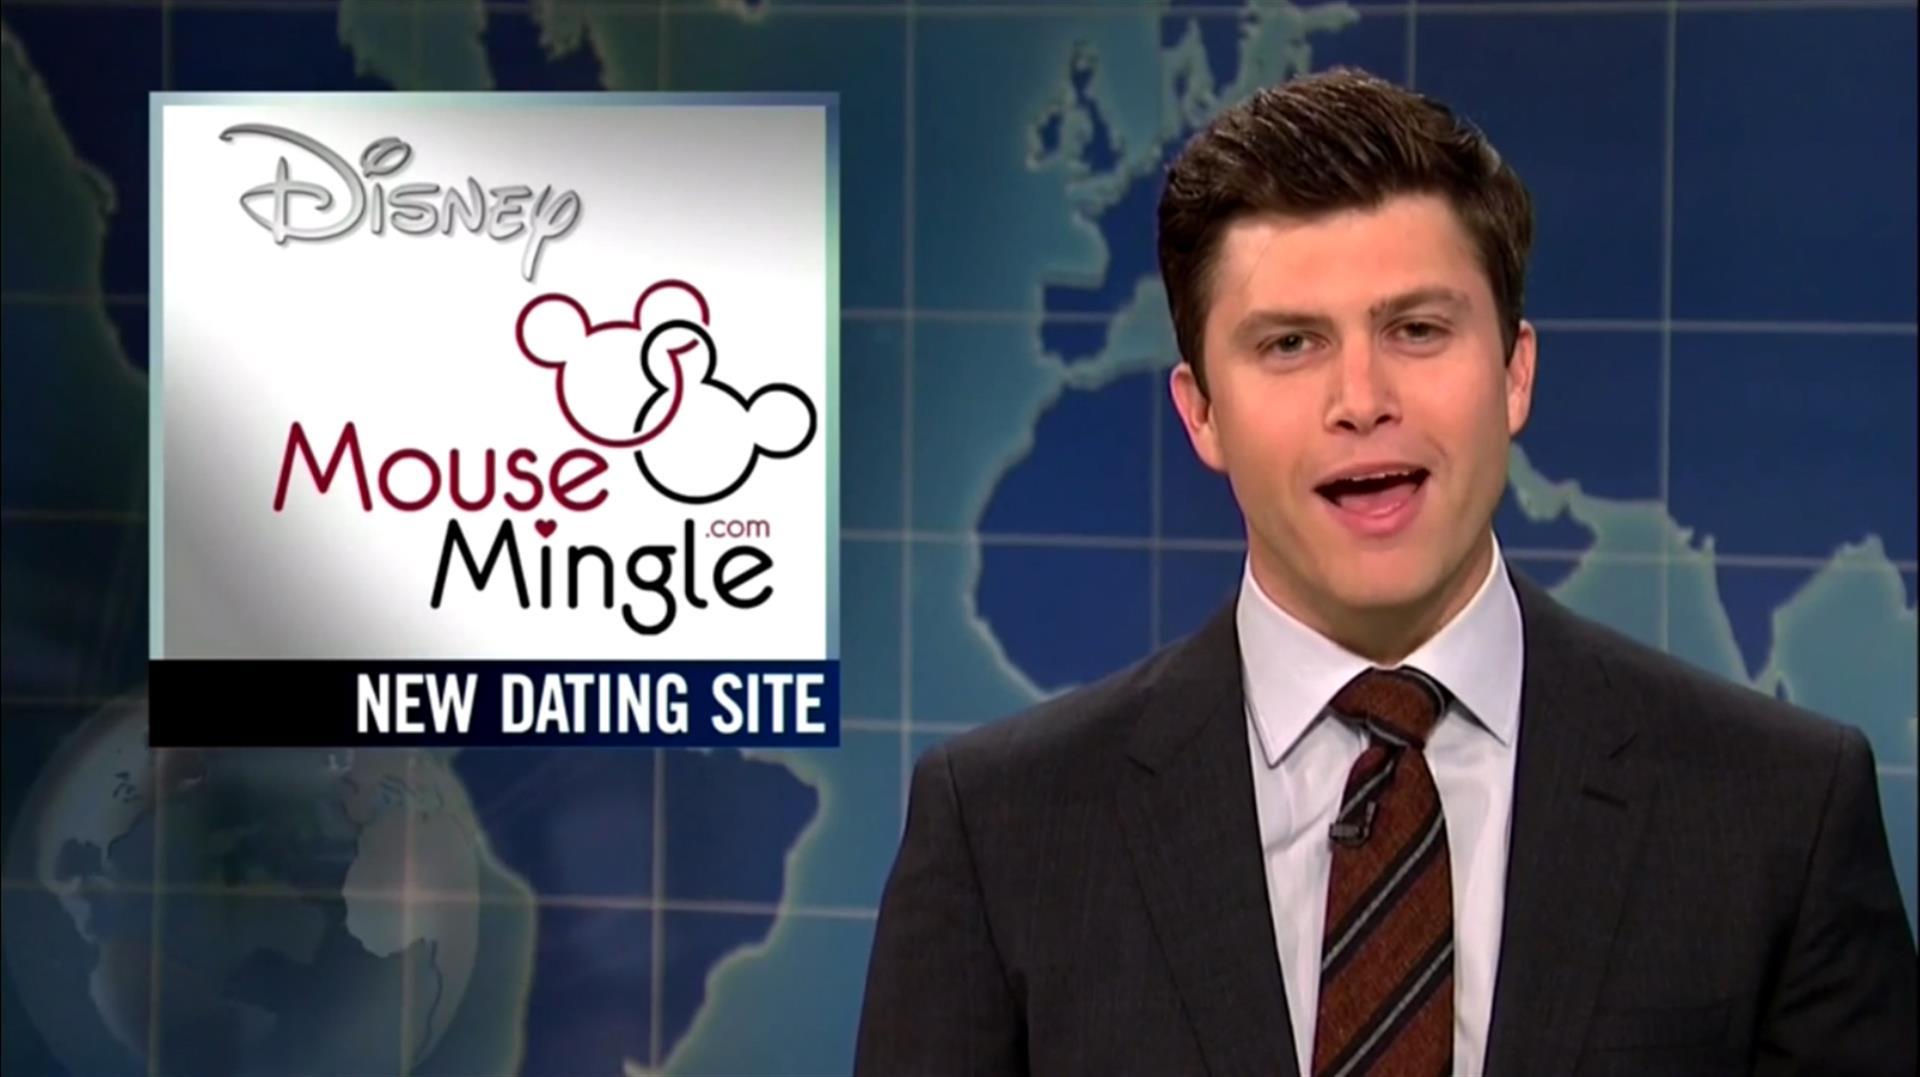 MouseMingle on Saturday Night Live | MouseMingle.com